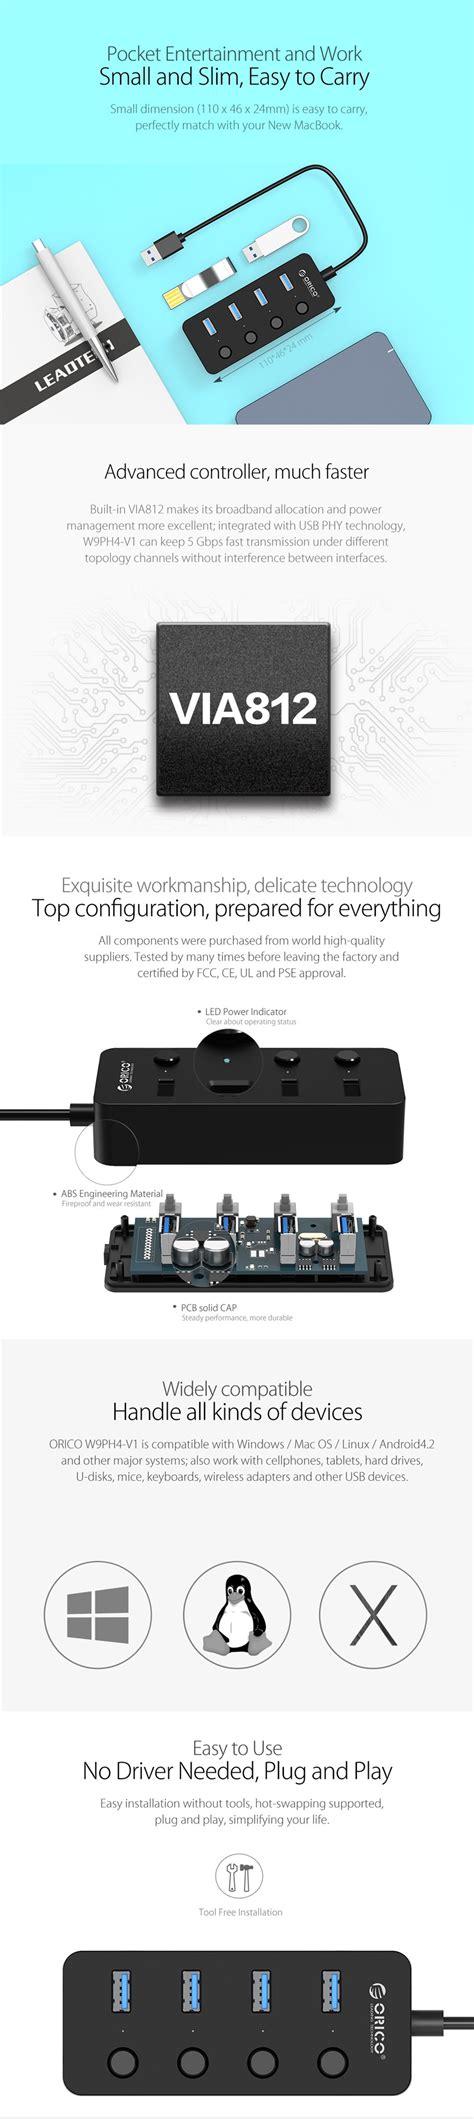 Special Orico W9ph4 4 Port Portable Usb 3 0 Hub orico w9ph4 portable 4 ports hub usb3 0 pour ordinateur